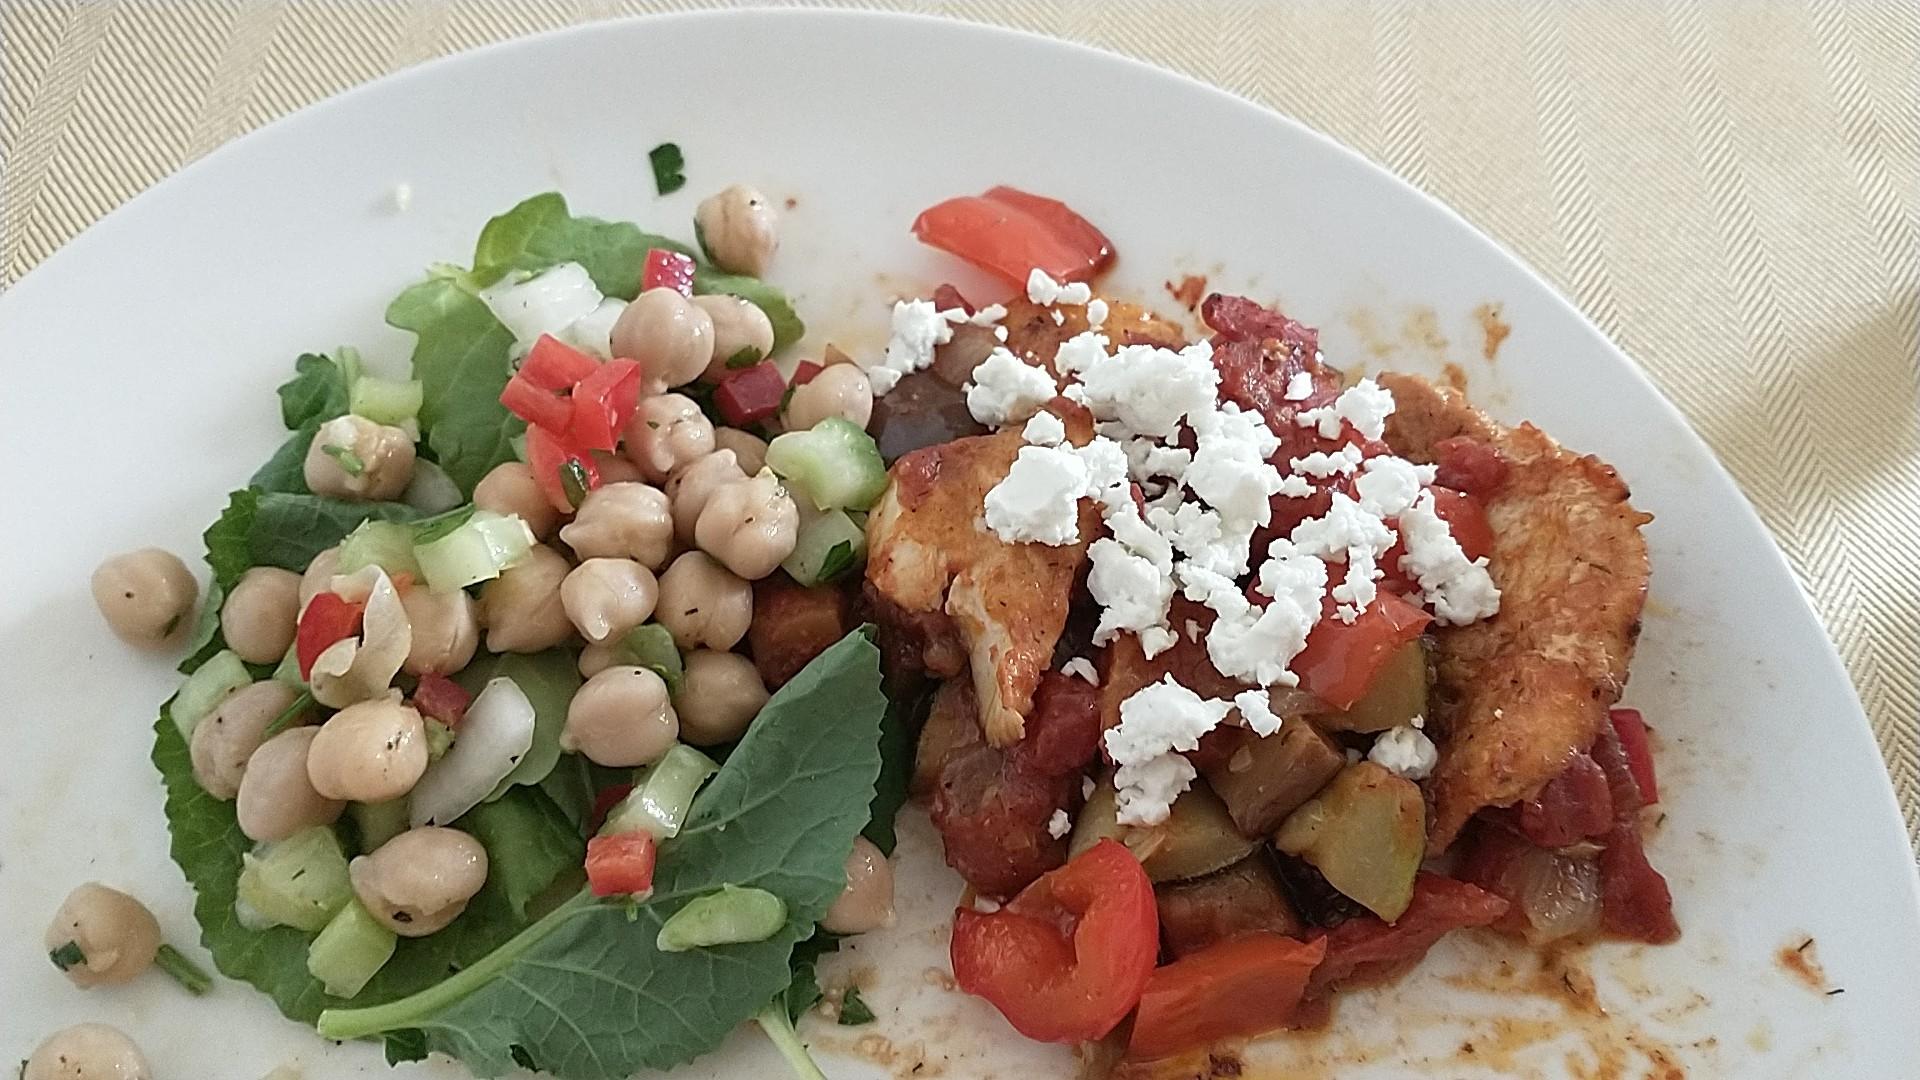 Mediterranean Chicken Medley with Eggplant and Feta